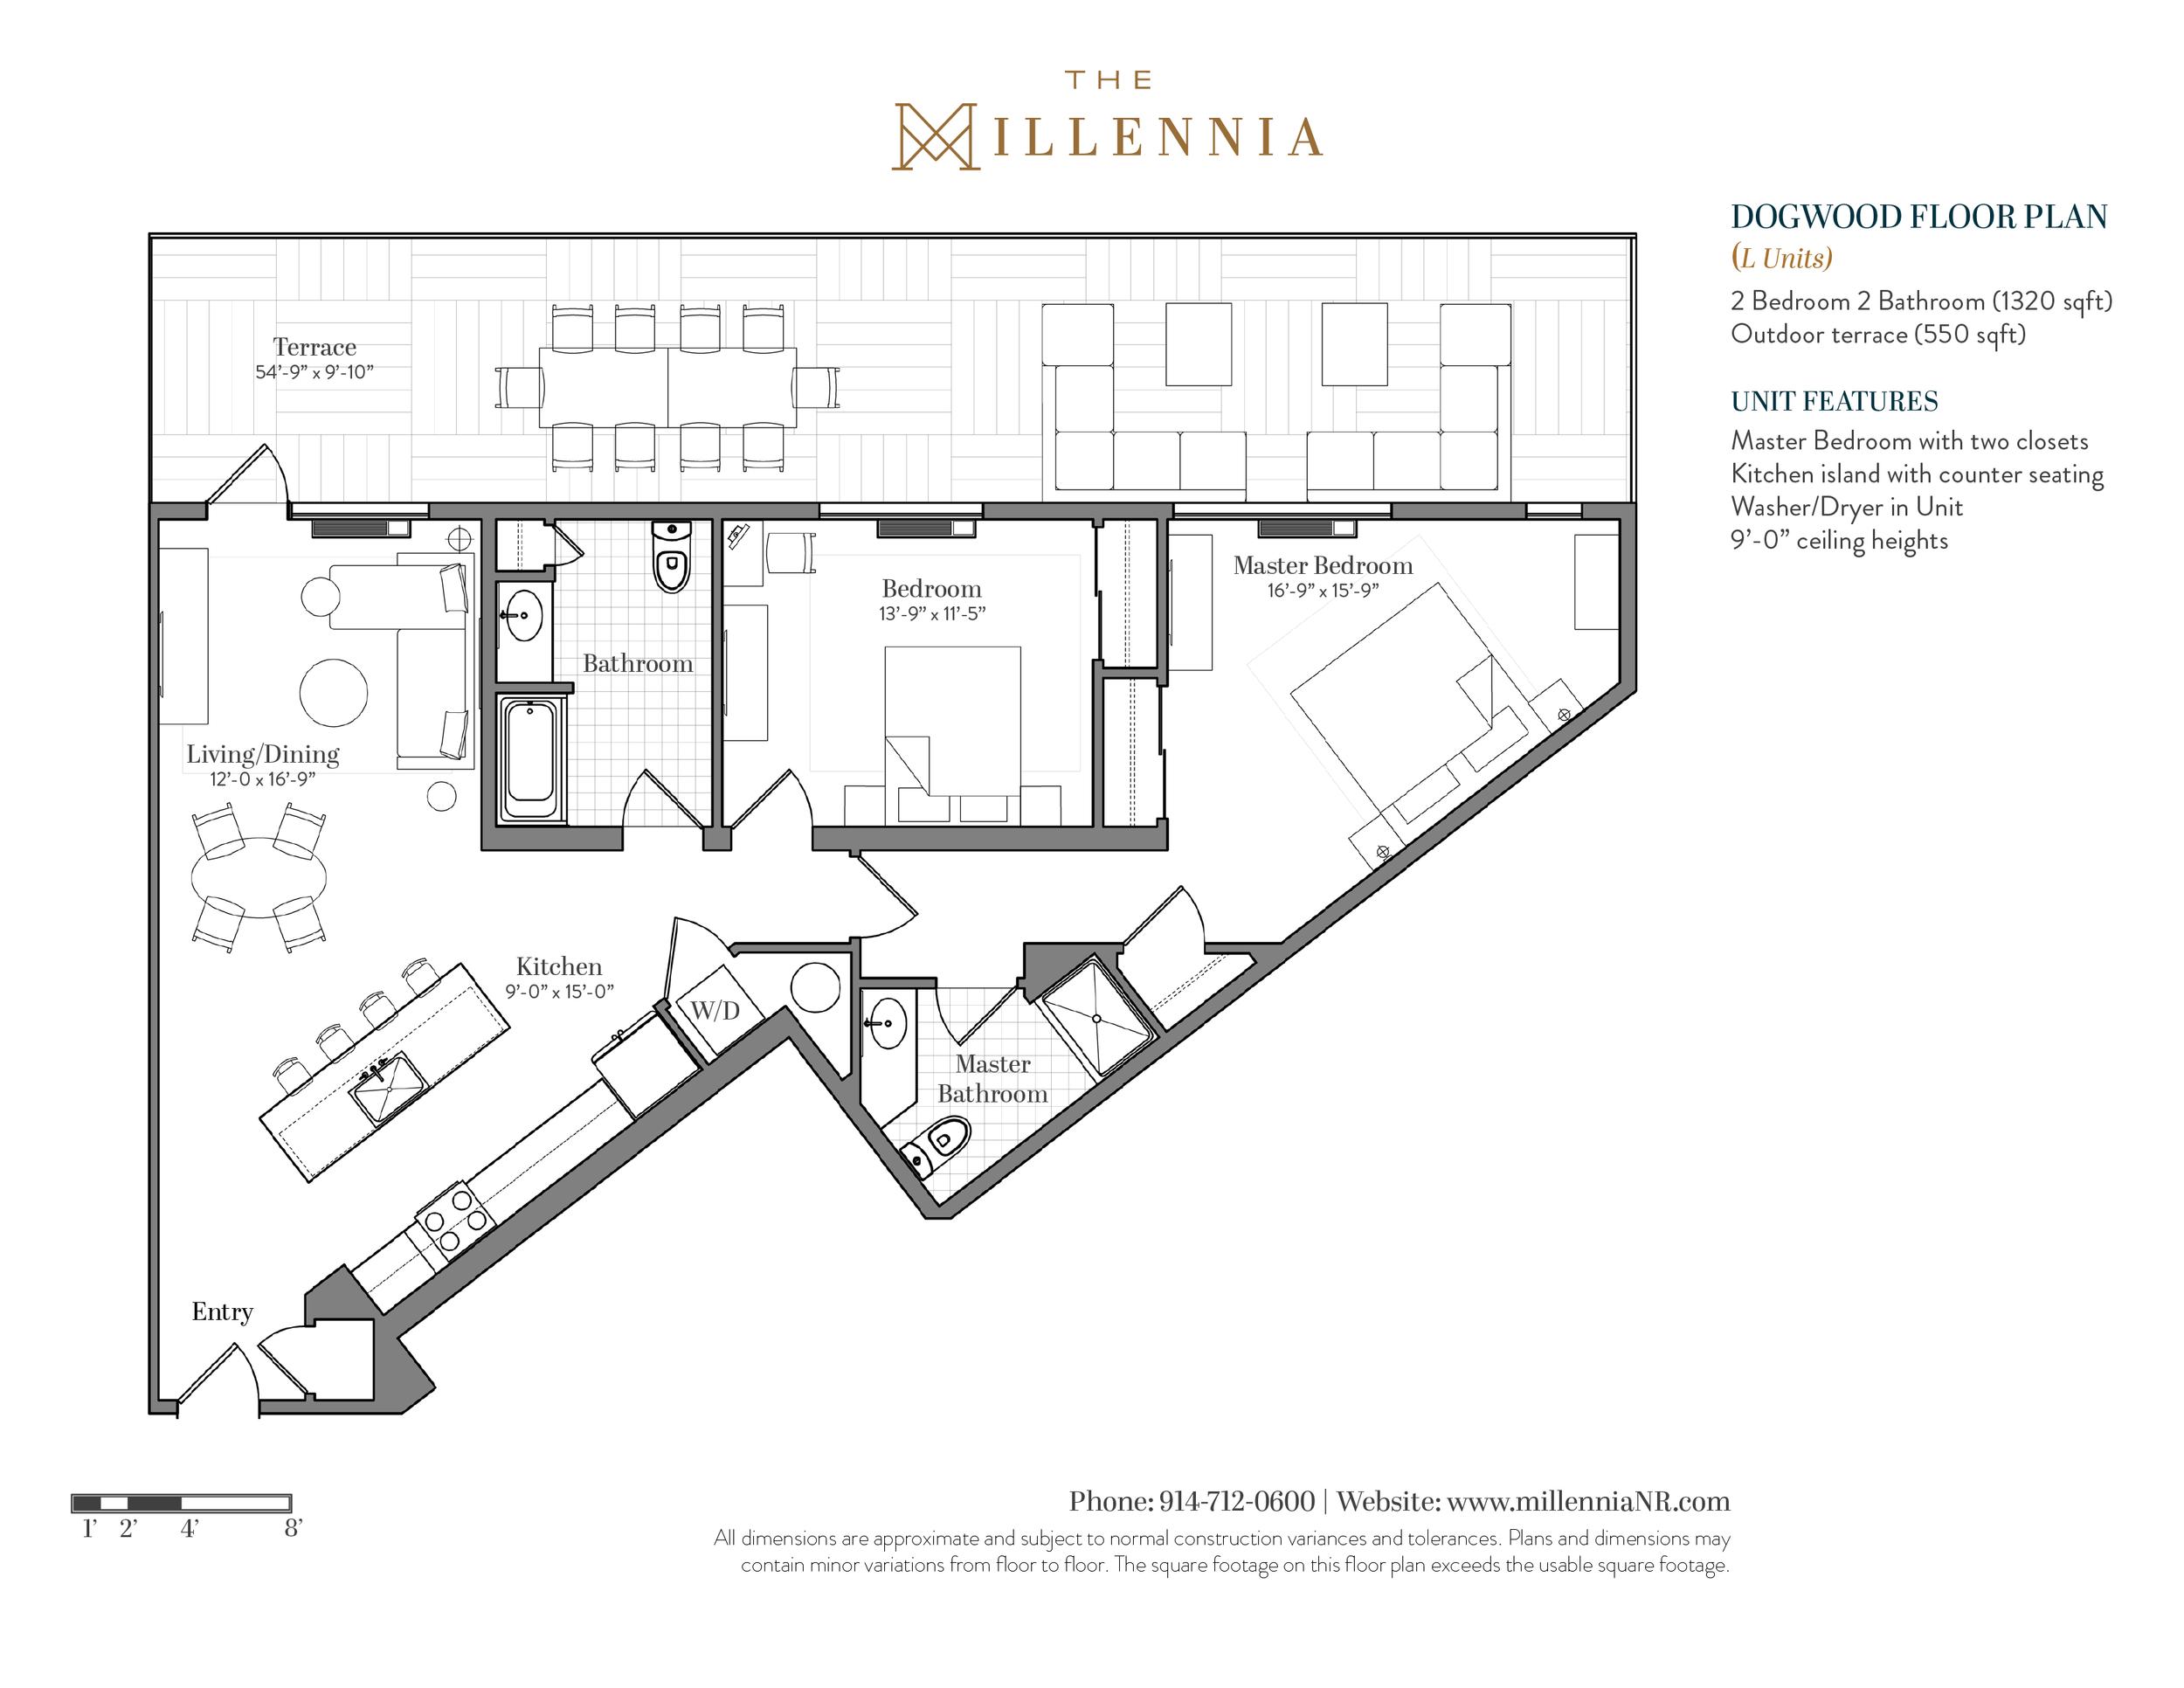 Millennia_Floorplans_Dogwood.png